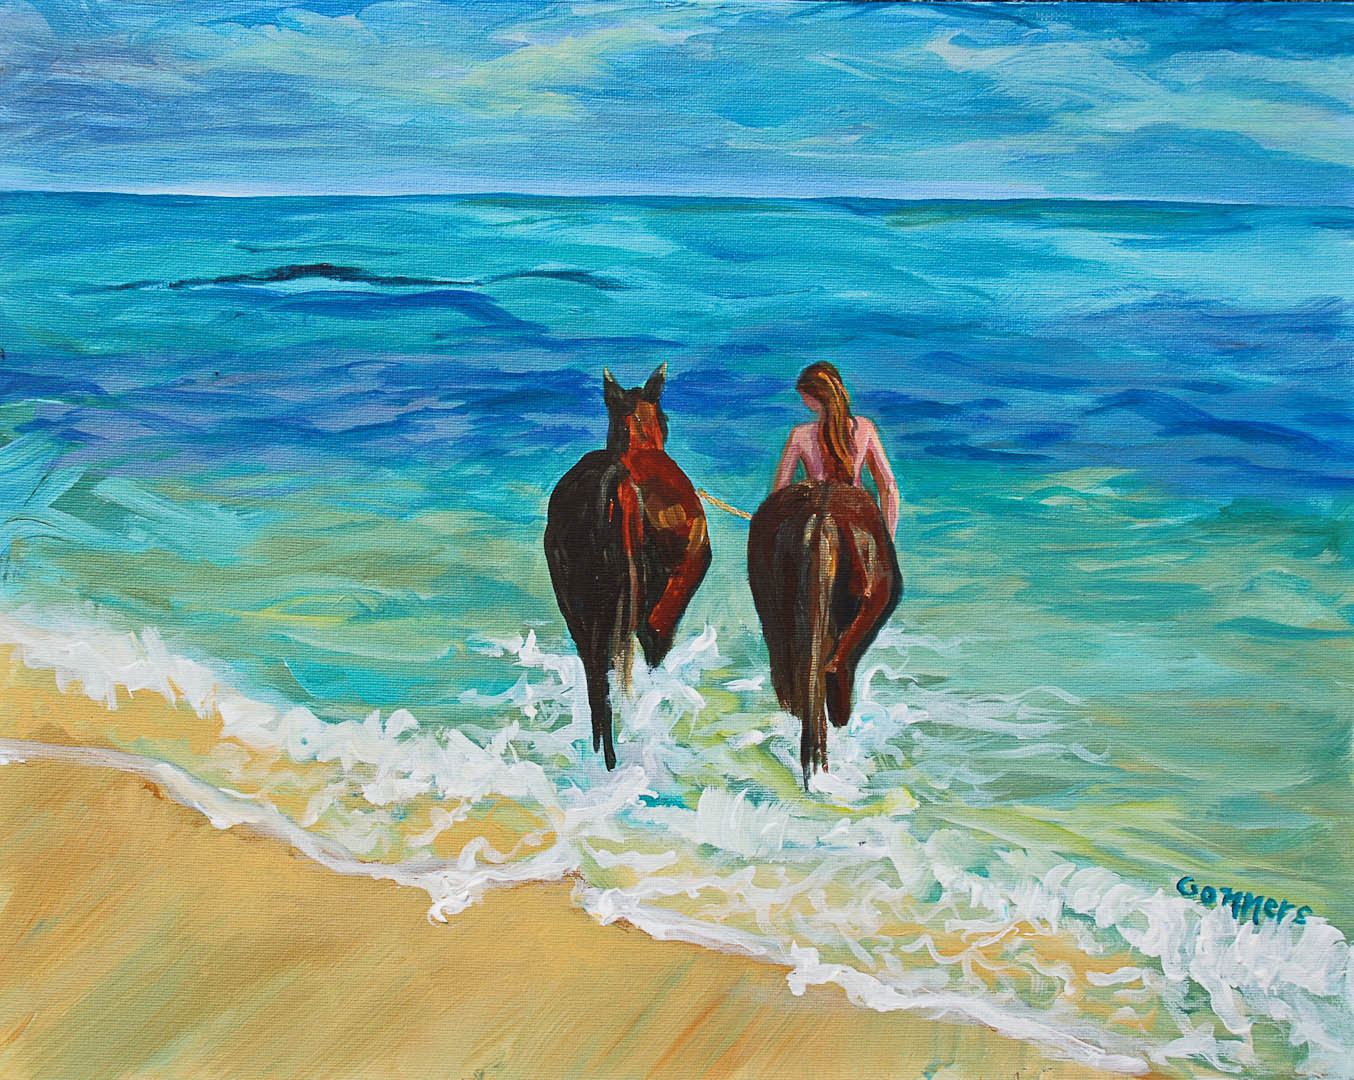 "07 Centaur Woman, Acrylic on canvas board, 16 x 20"" $1600"